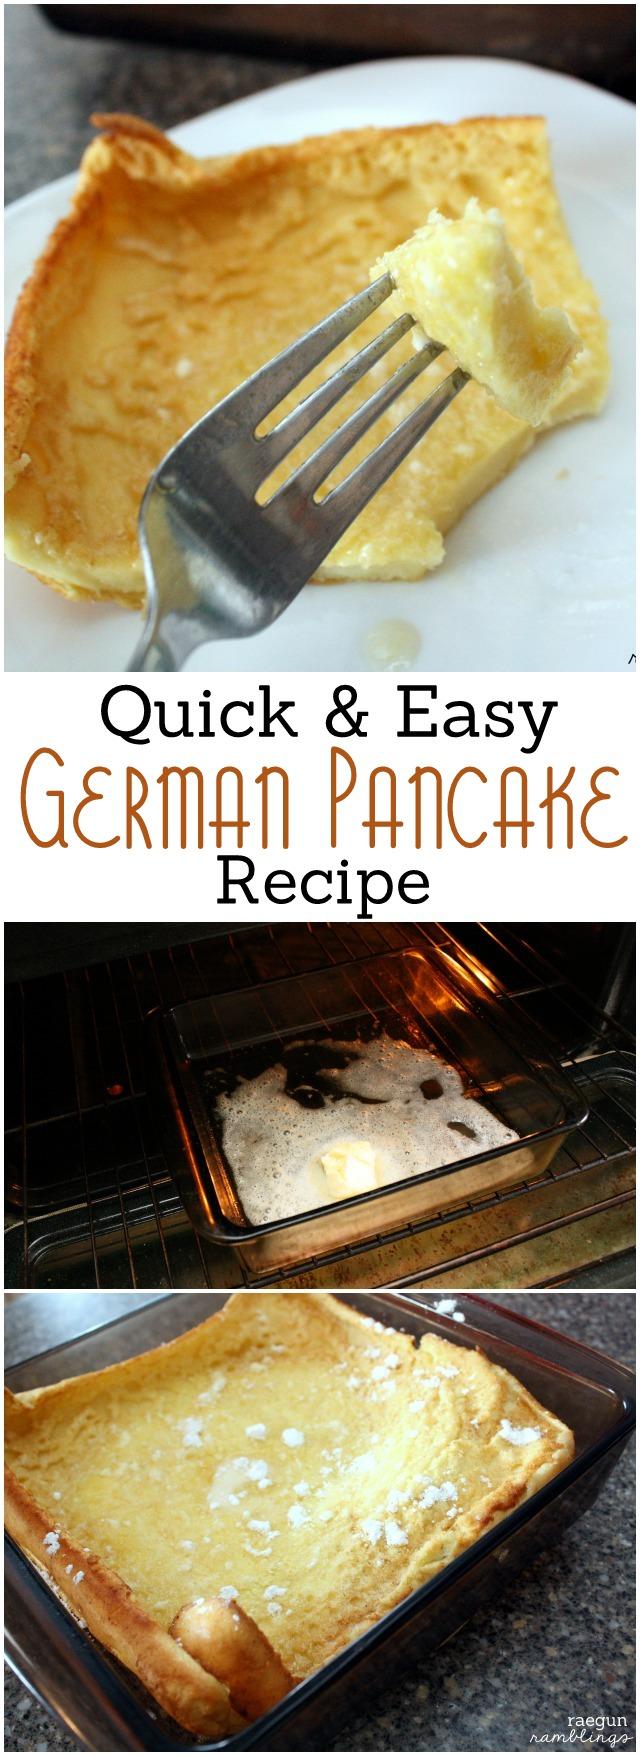 Love this Dutch Baby German Pancake recipe I've tried it so many times. from Rae Gun Ramblings